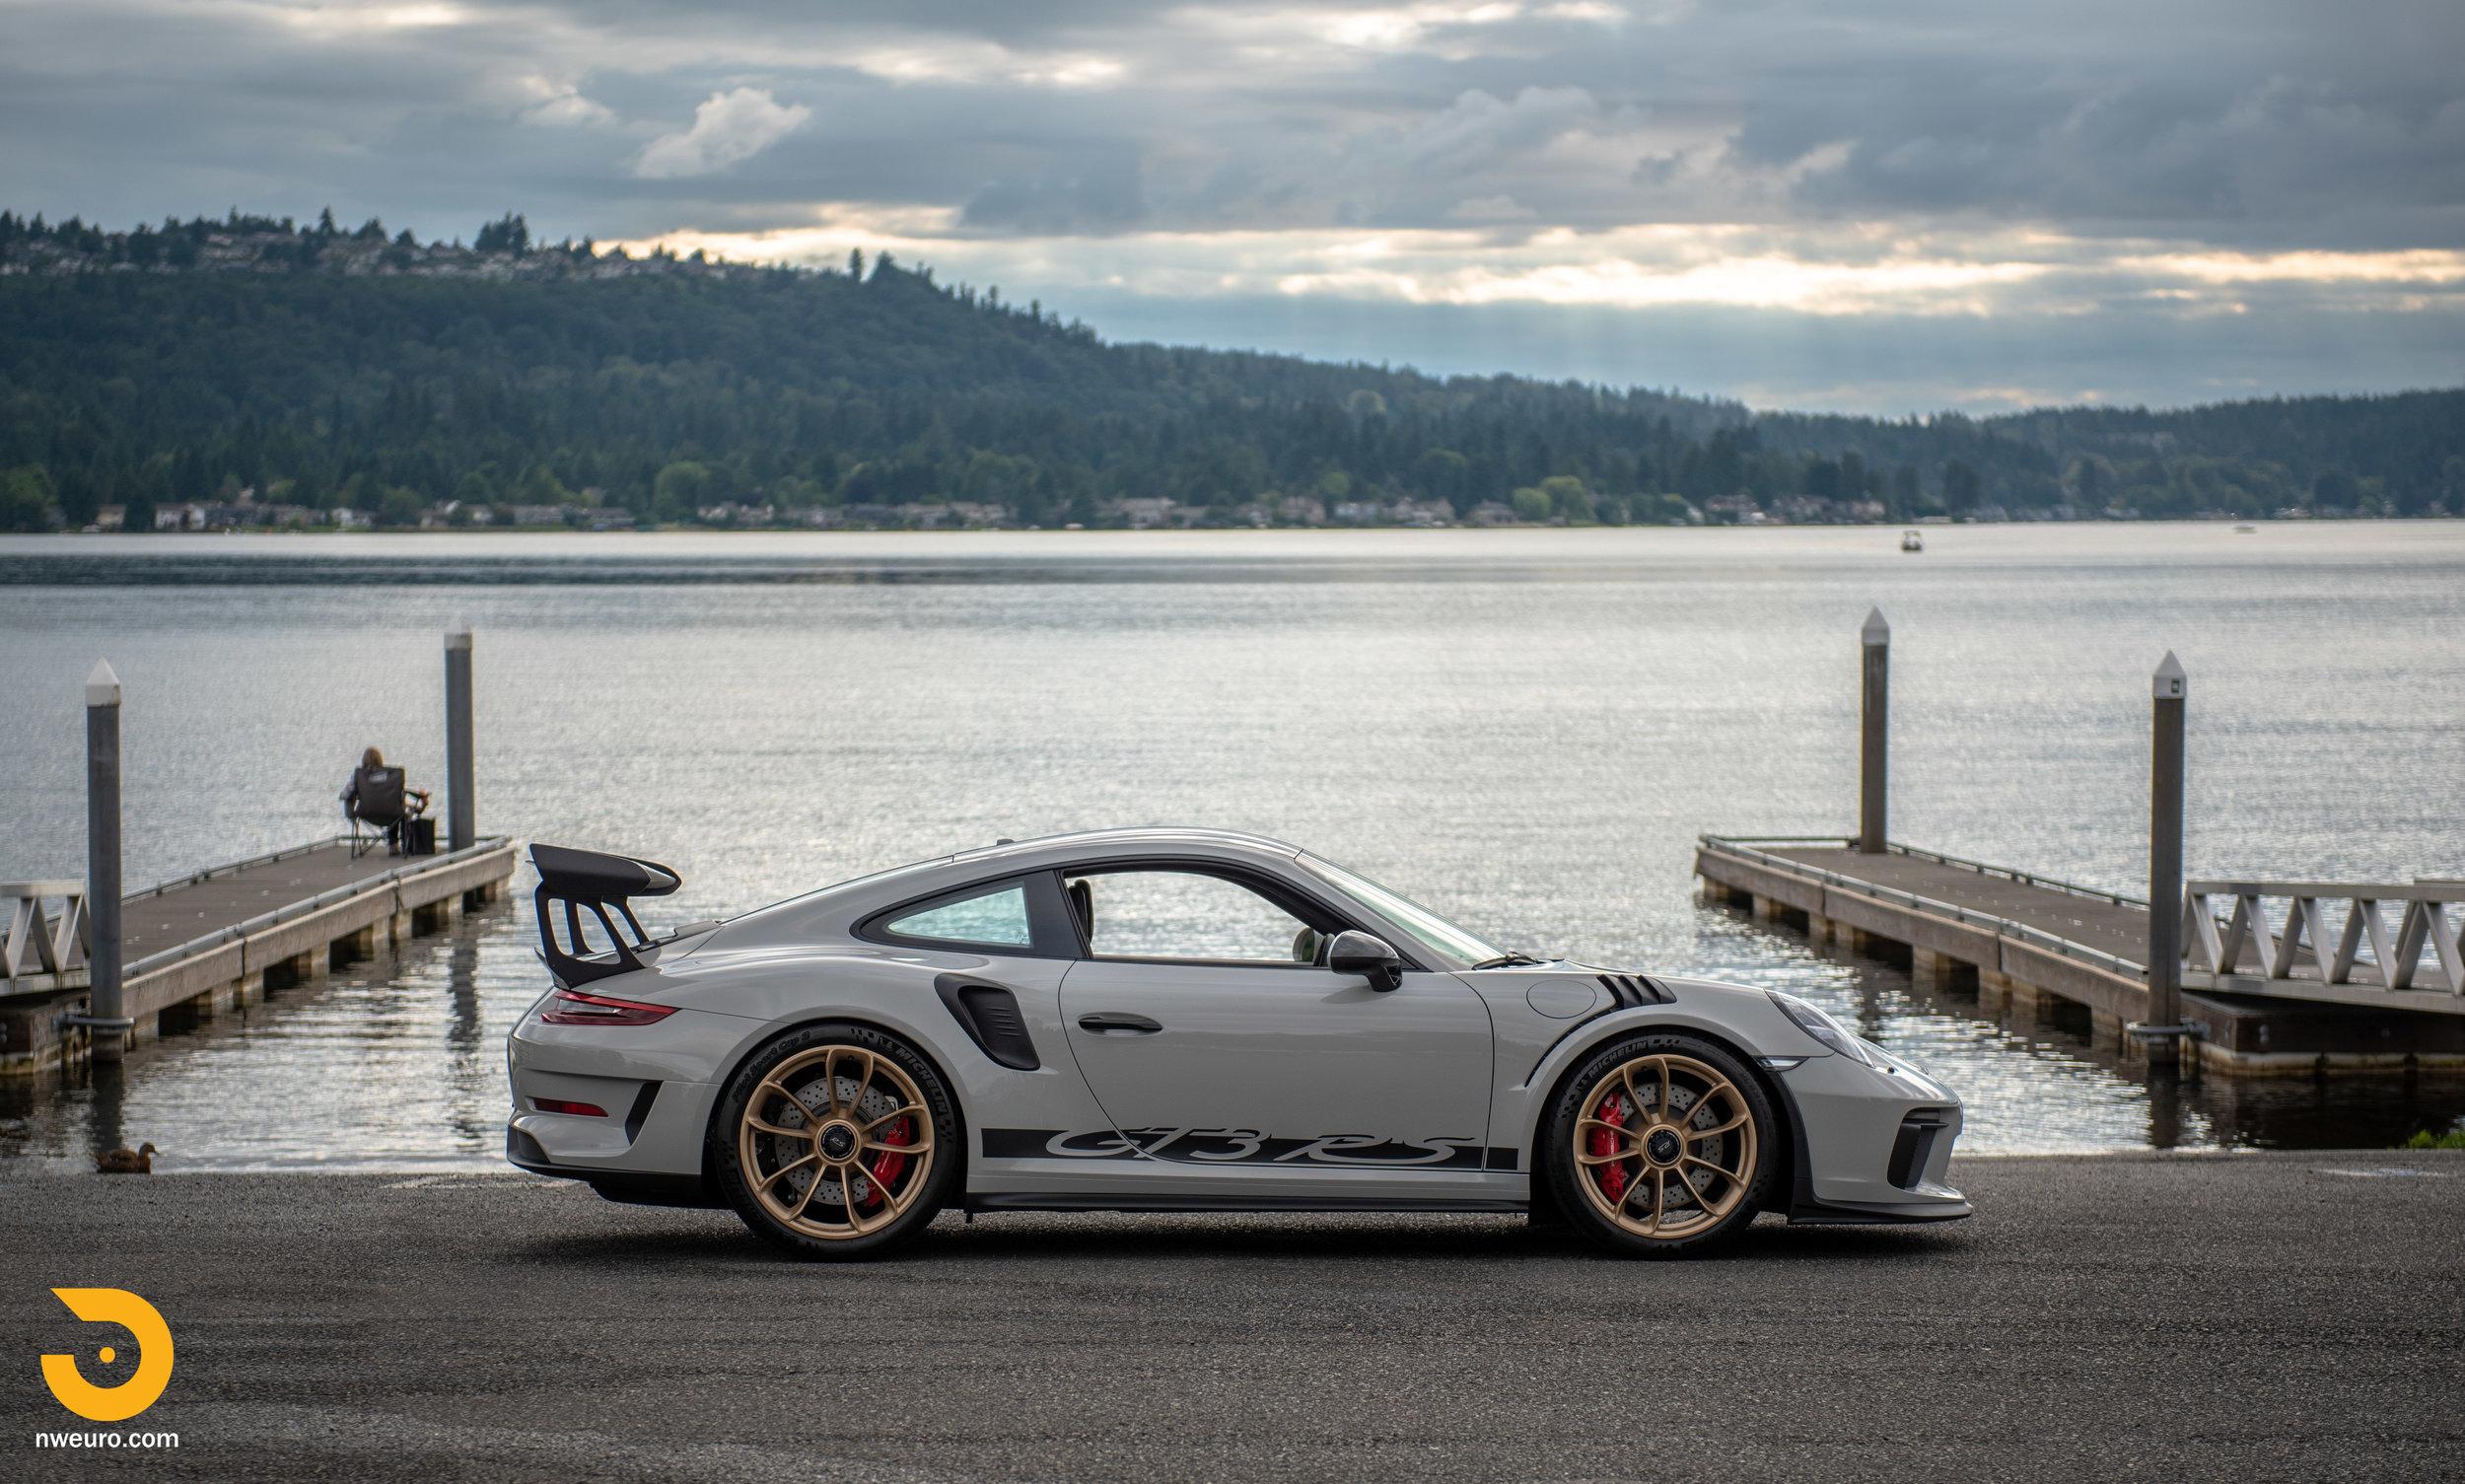 2019 Porsche GT3 RS - Chalk-14.jpg